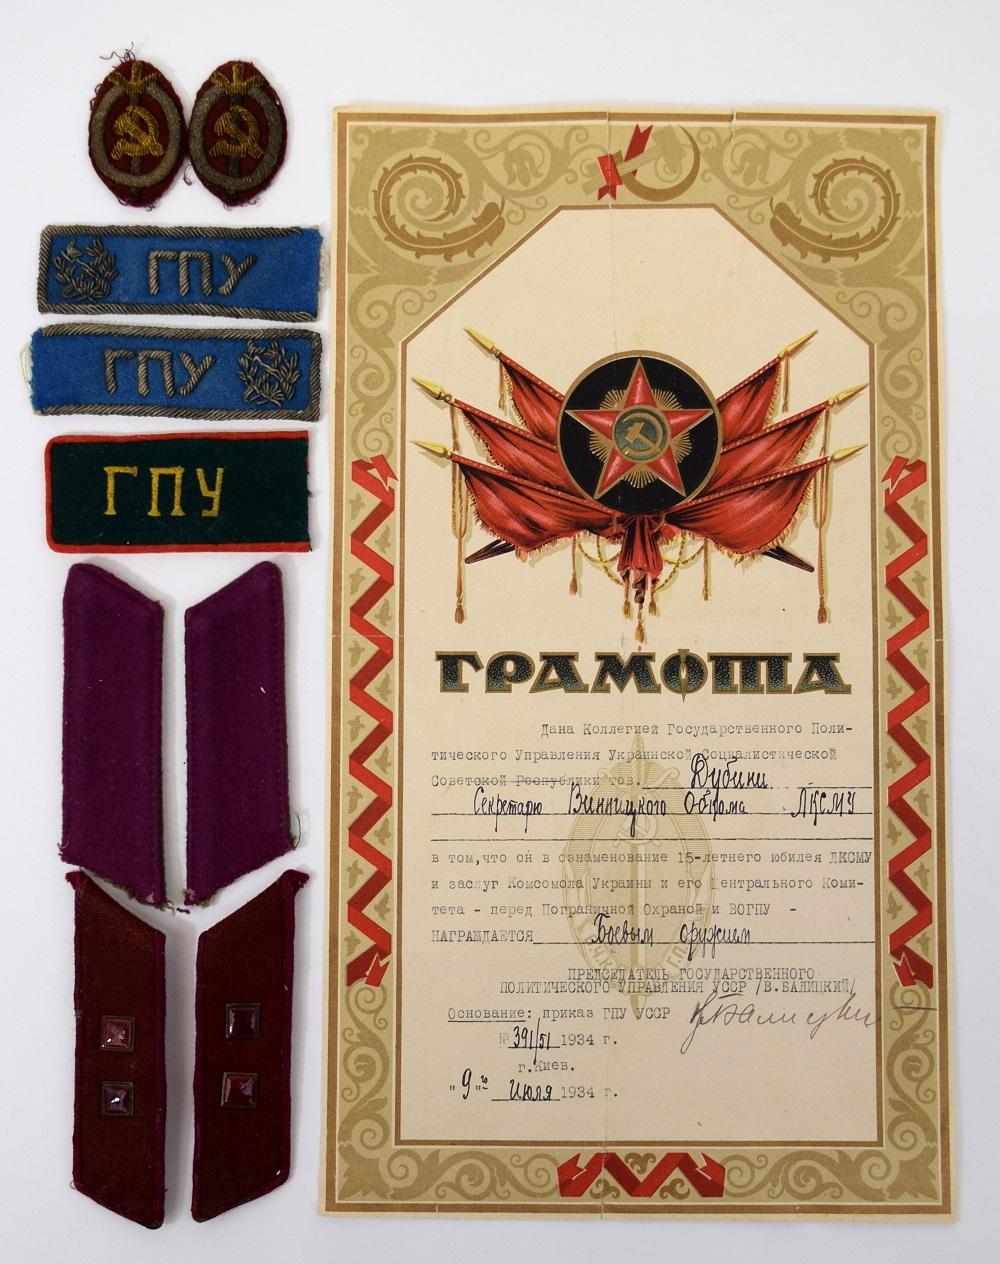 Soviet Award Citation Document to comrade Dubini., Komsomol secretary of Vinitzki region